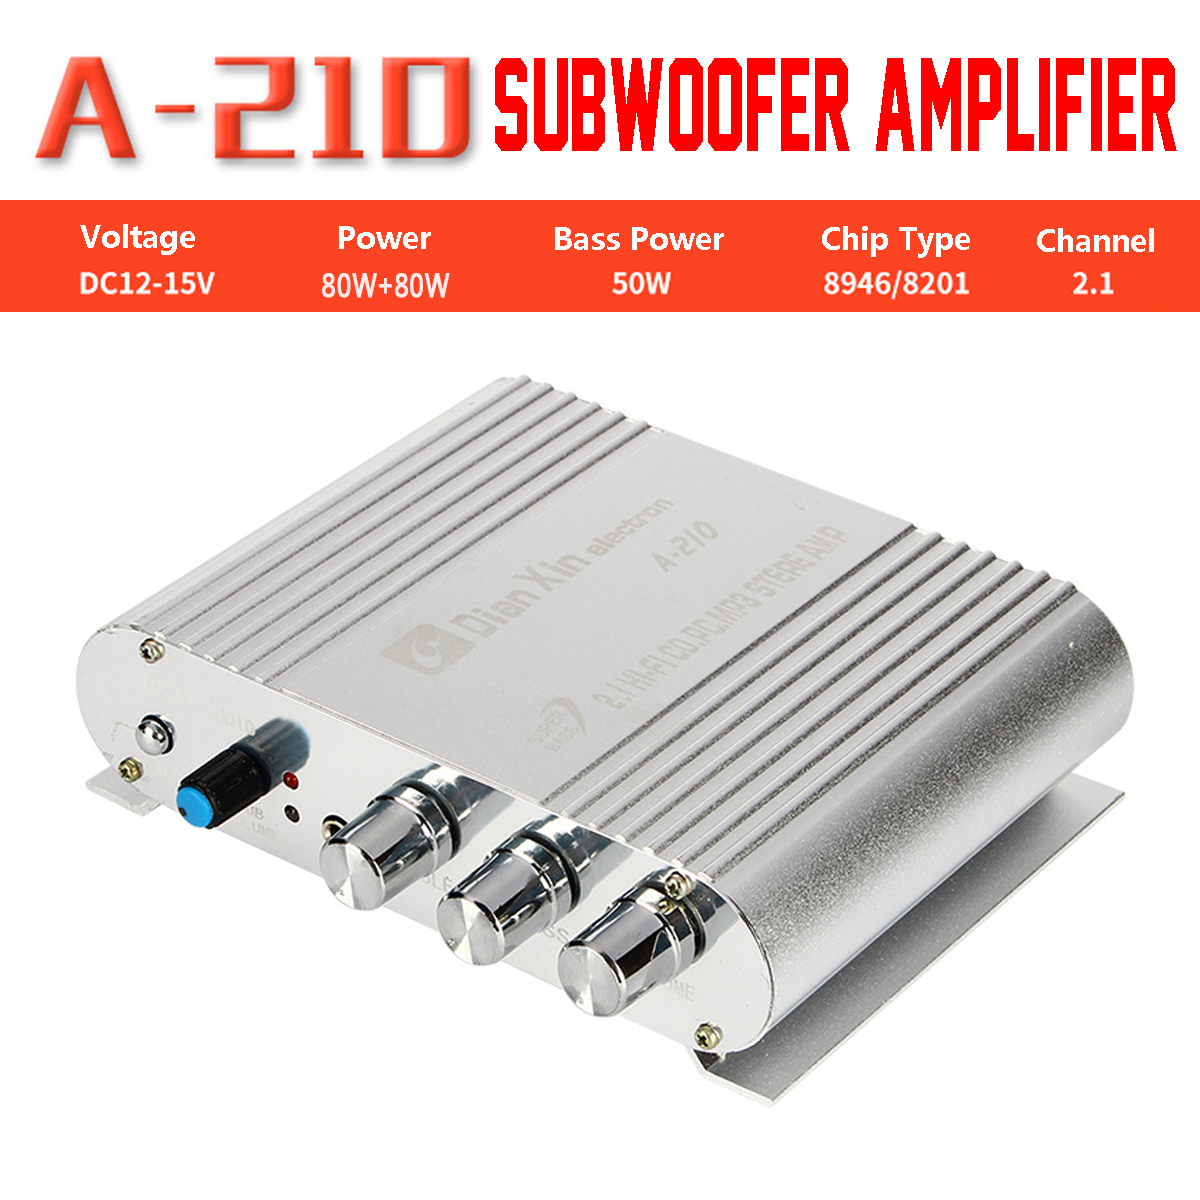 Hi-Fi Car Channel Amplifier 12V 2.1CH A-210 Speaker Car Motorcycle Bass Audio Power Amplifier Hi-Fi MP3 Audio Stereo DX-210